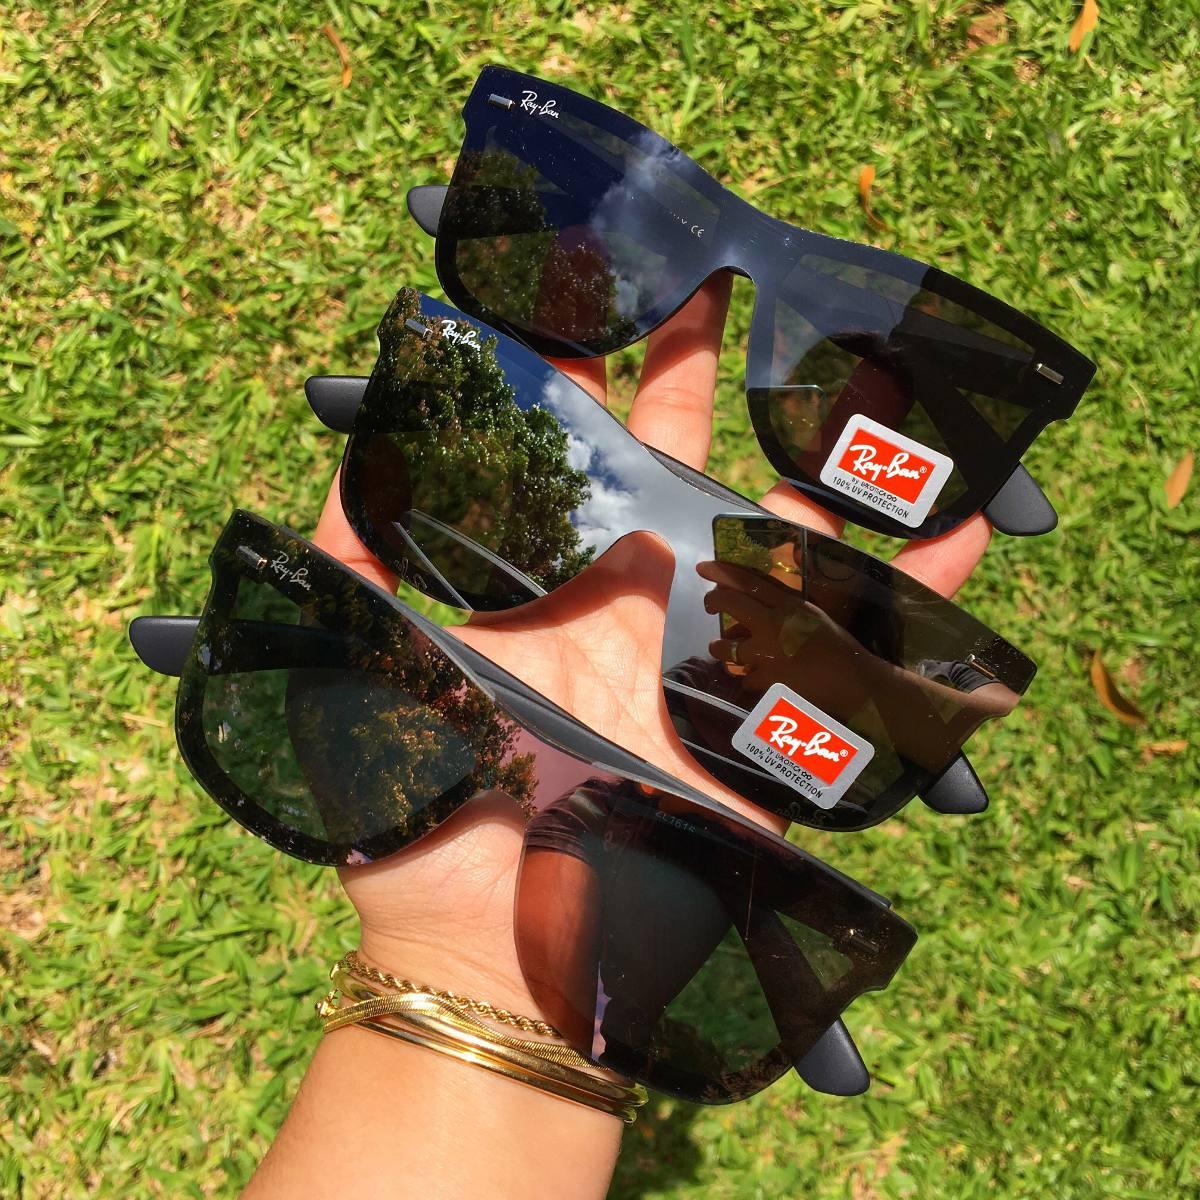 74d2e89c21c3b óculos de sol justin blaze ray ban original masculino unisex. Carregando  zoom... óculos sol justin ray ban. Carregando zoom.